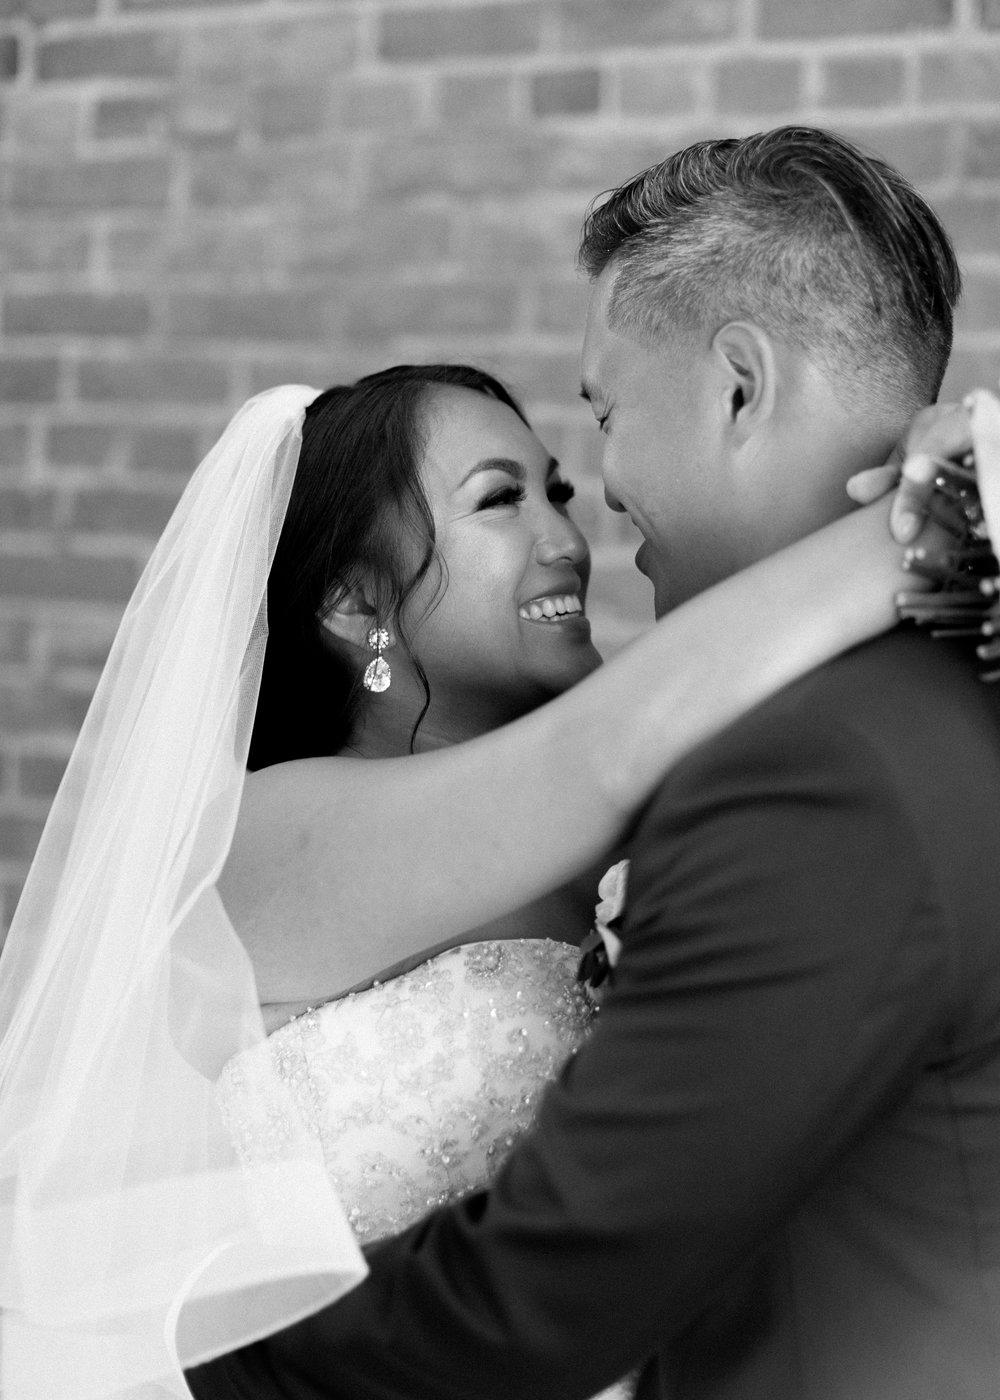 herastudios_wedding_kristina_kyle_hera_selects-59.jpg